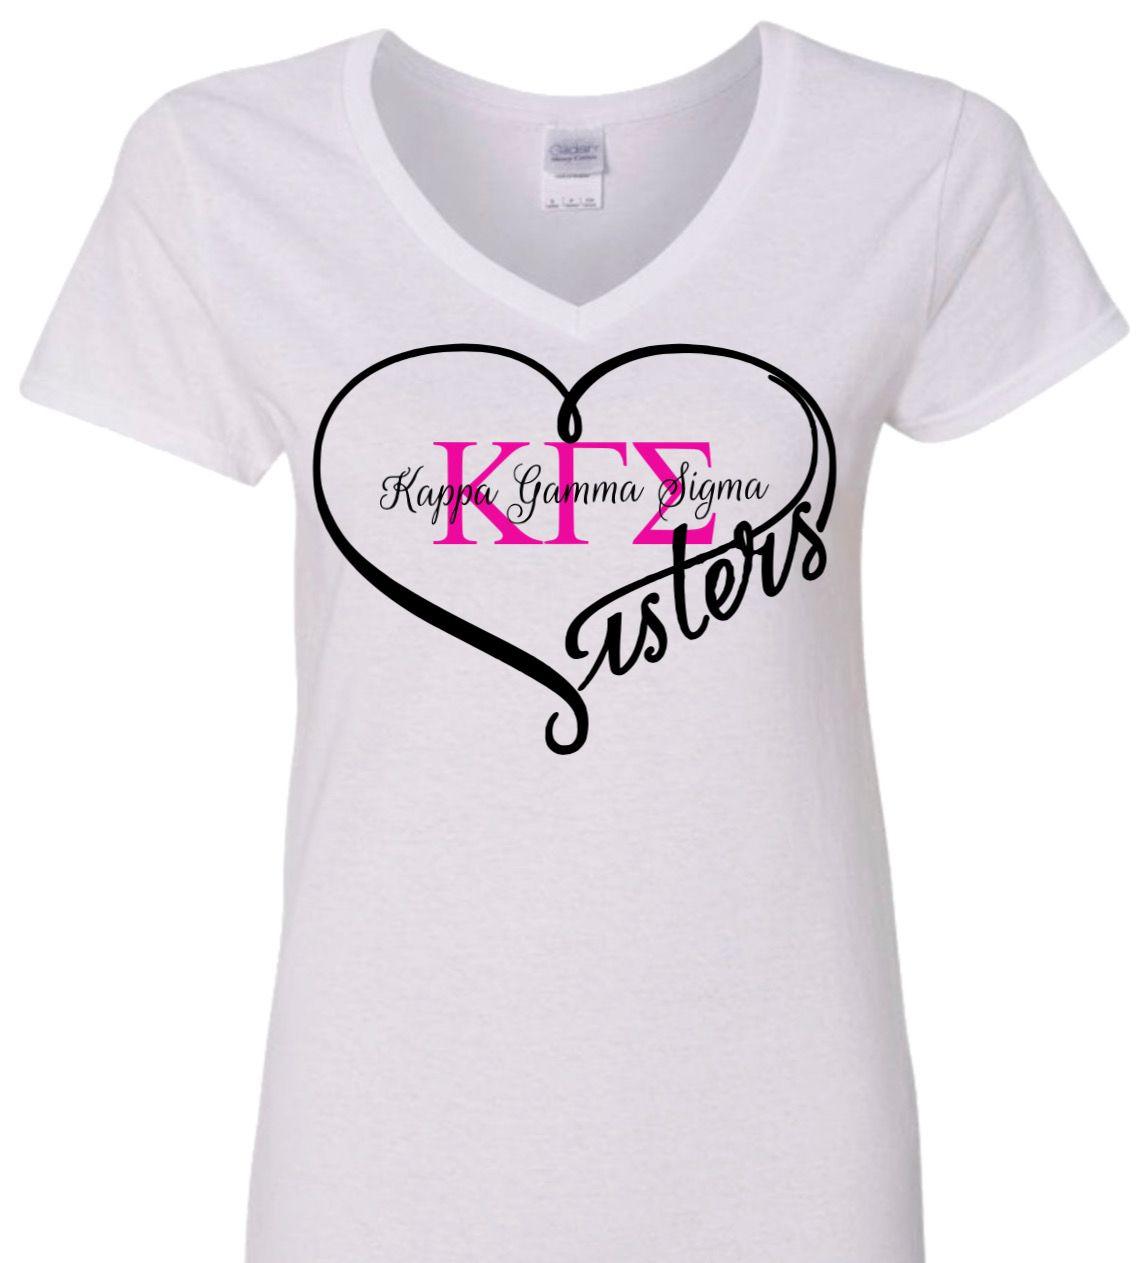 Kappa Kappa Gamma sport top #prairiepatcheslawrence #